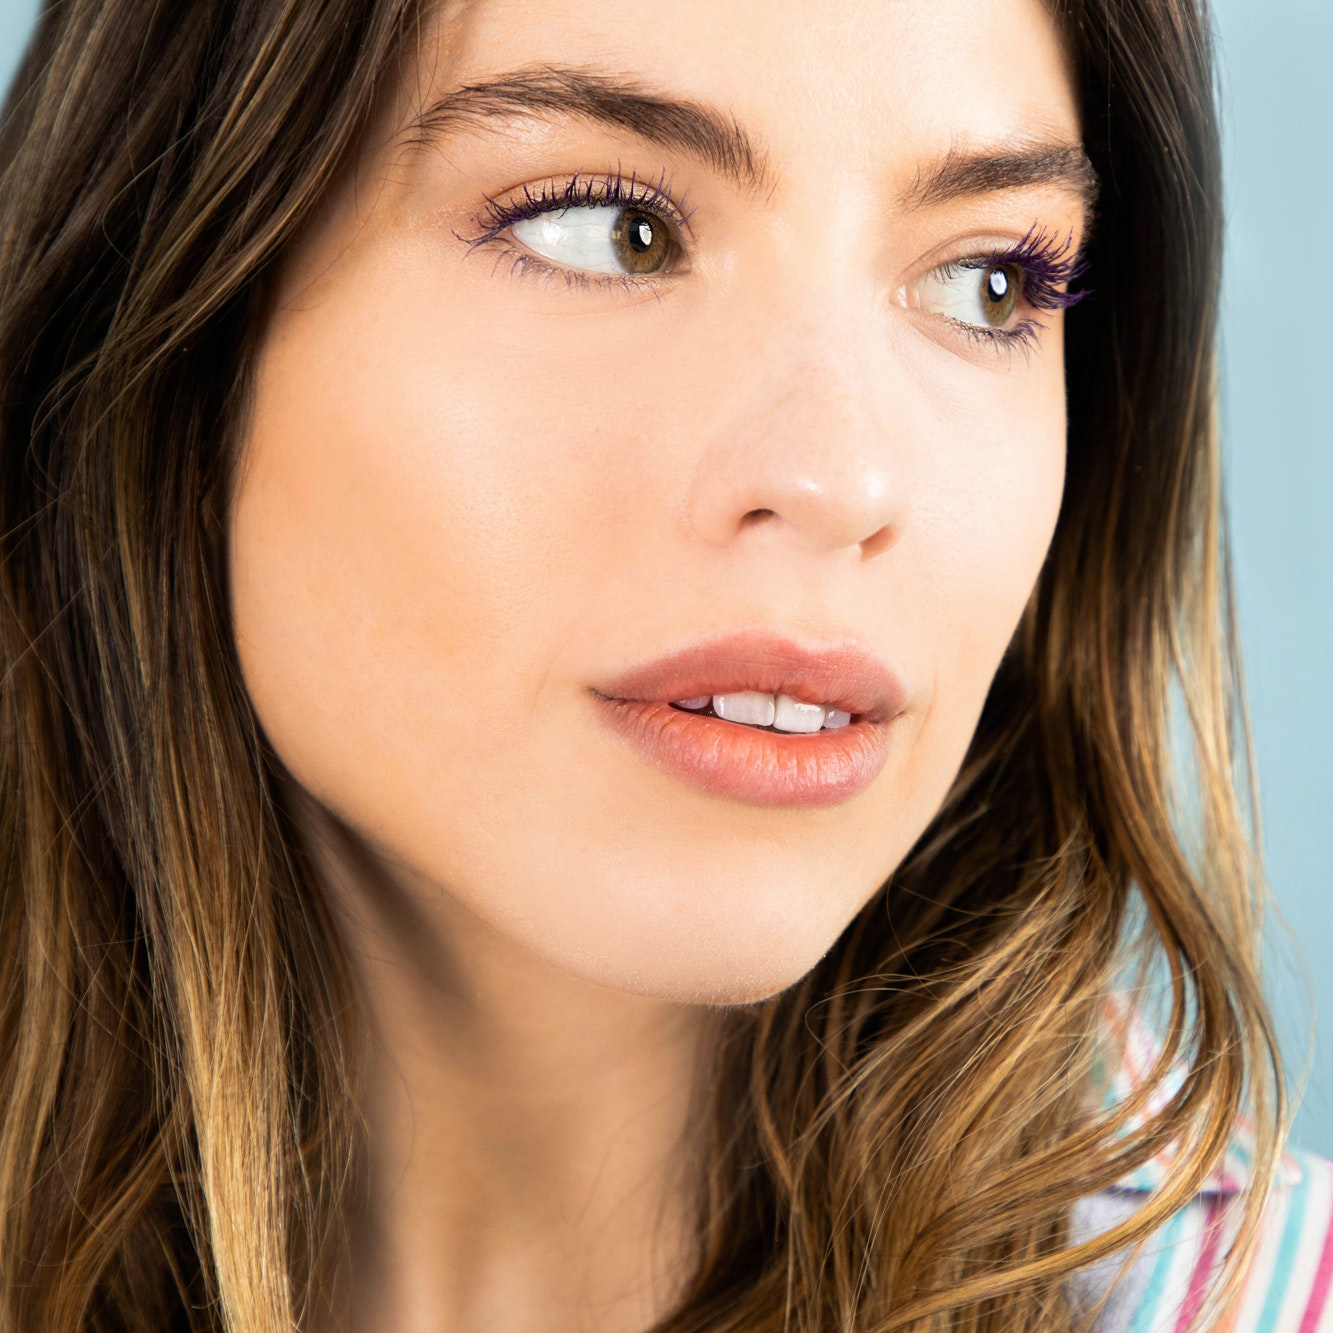 Sophie Wirt, Beauty Editor